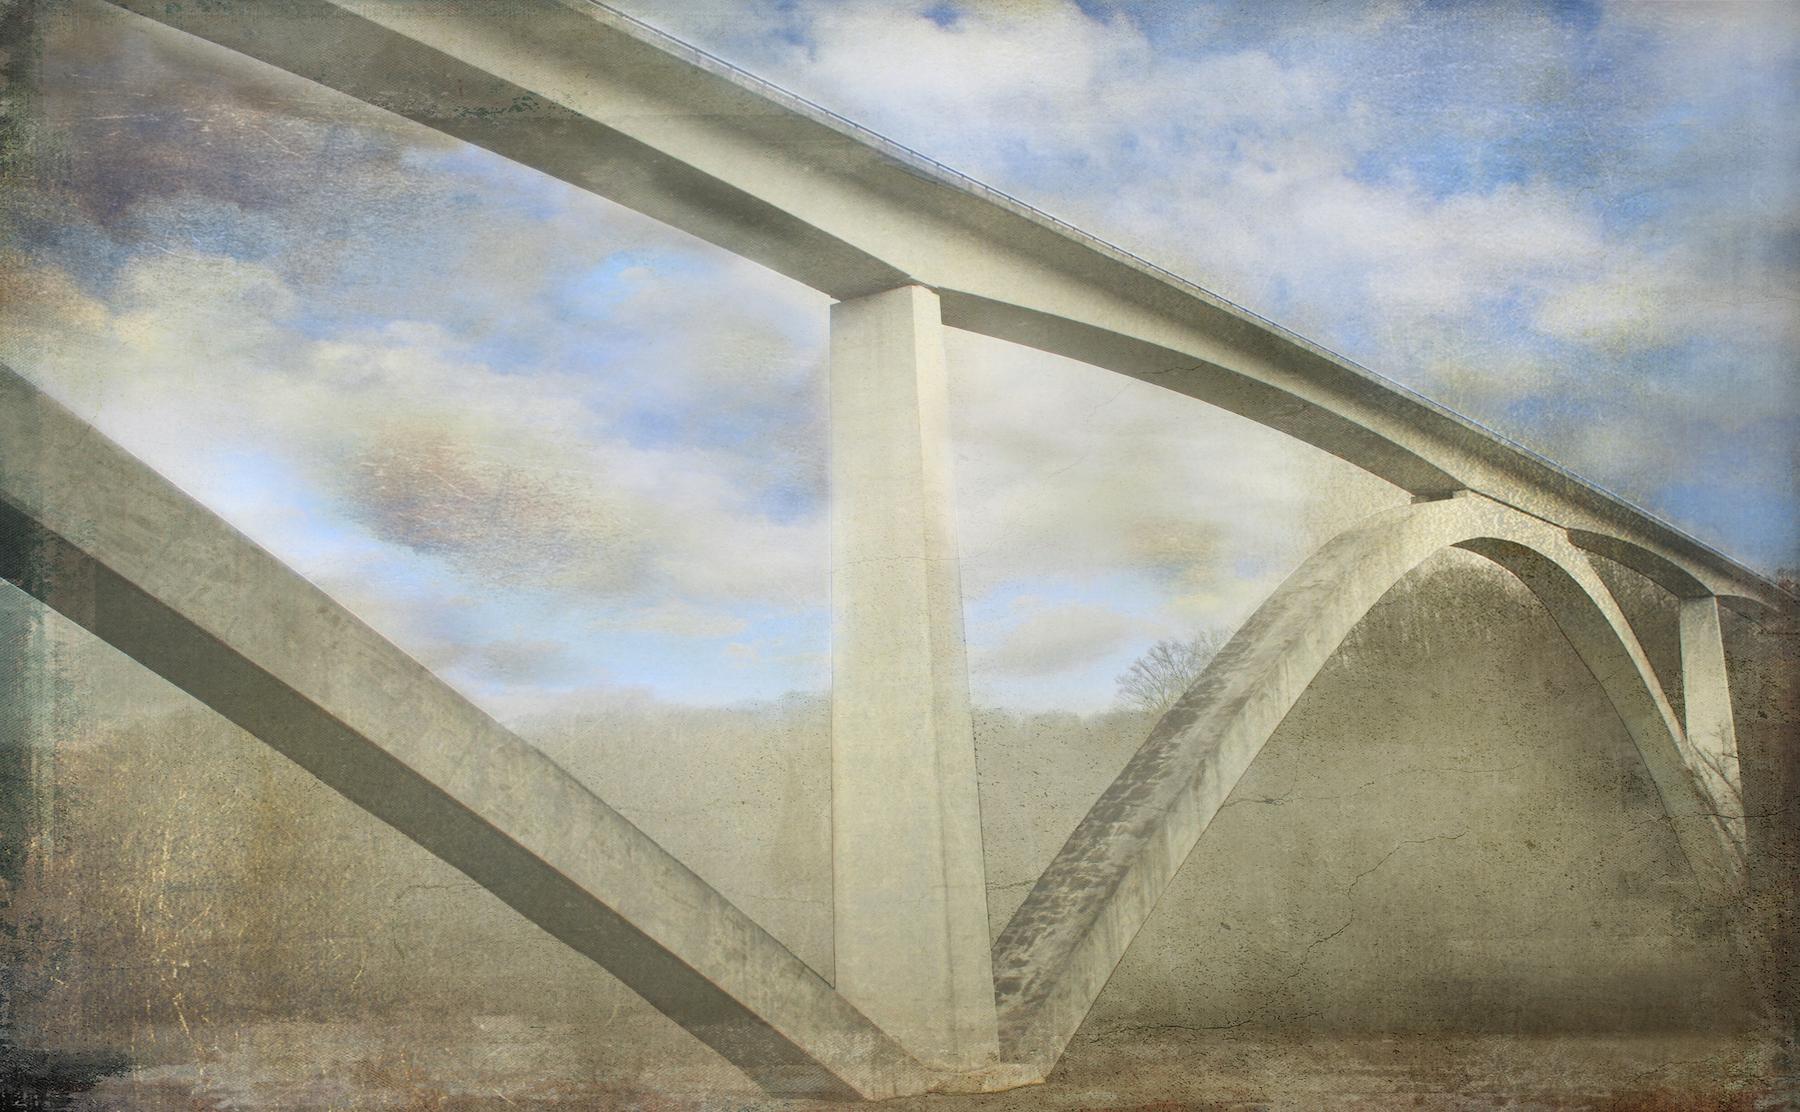 natchez trace bridge with new blue sky.jpg